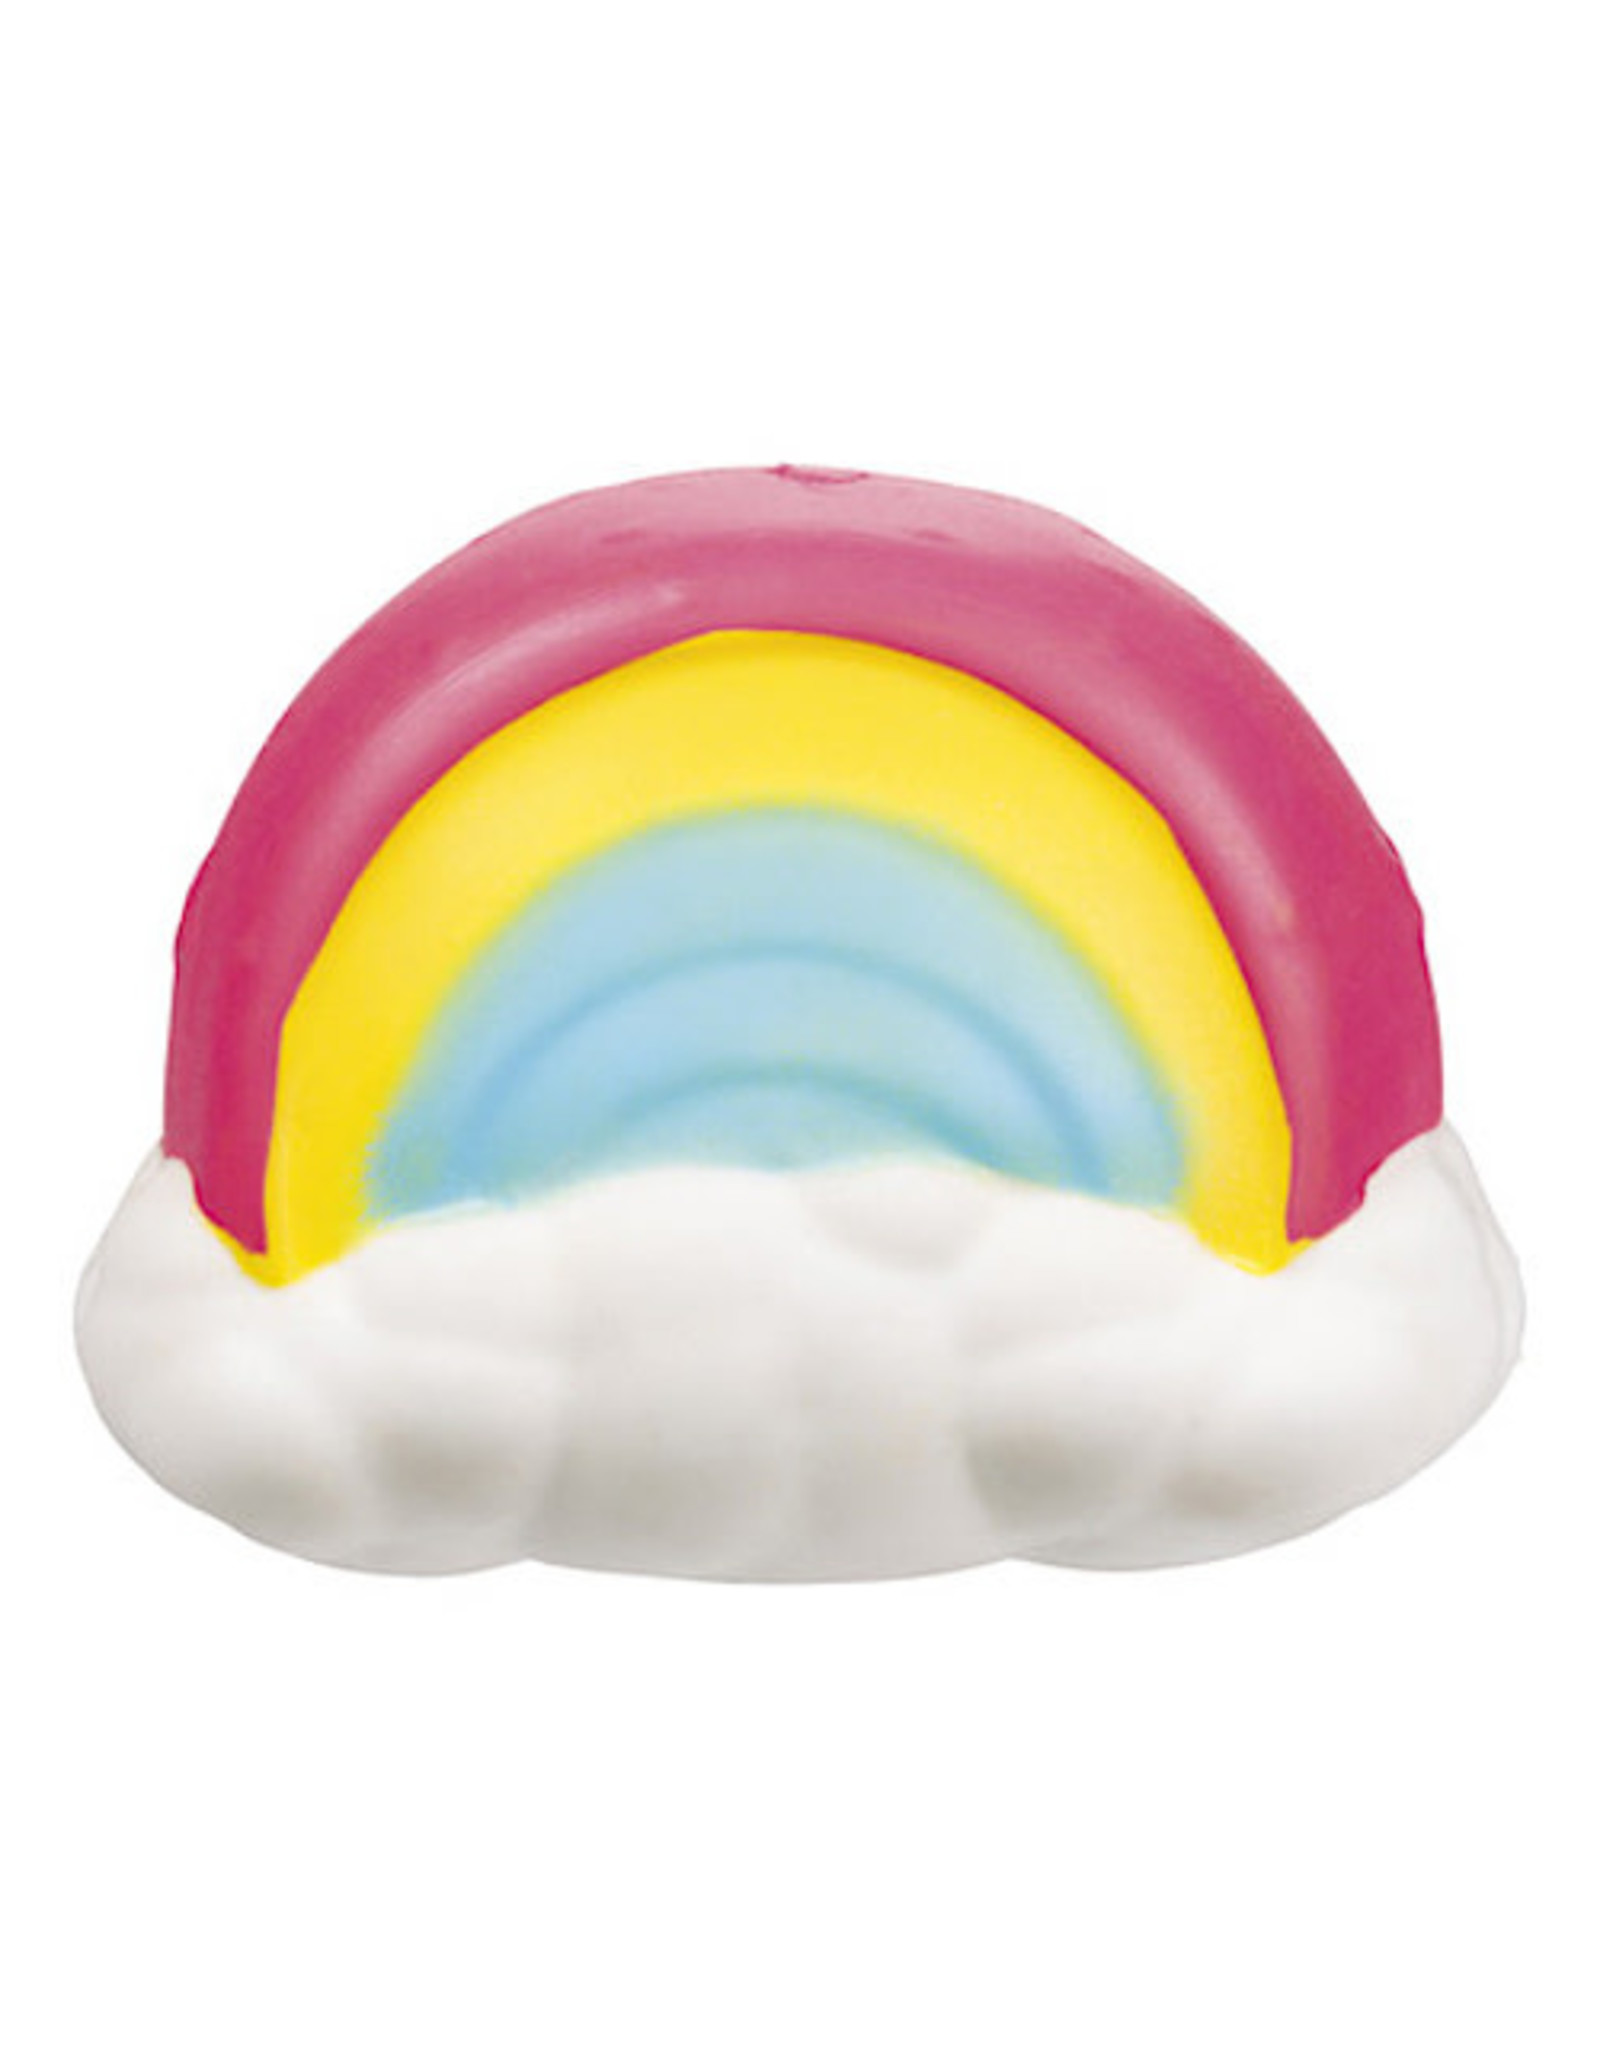 Keycraft Squeezy Unicorn & Rainbow